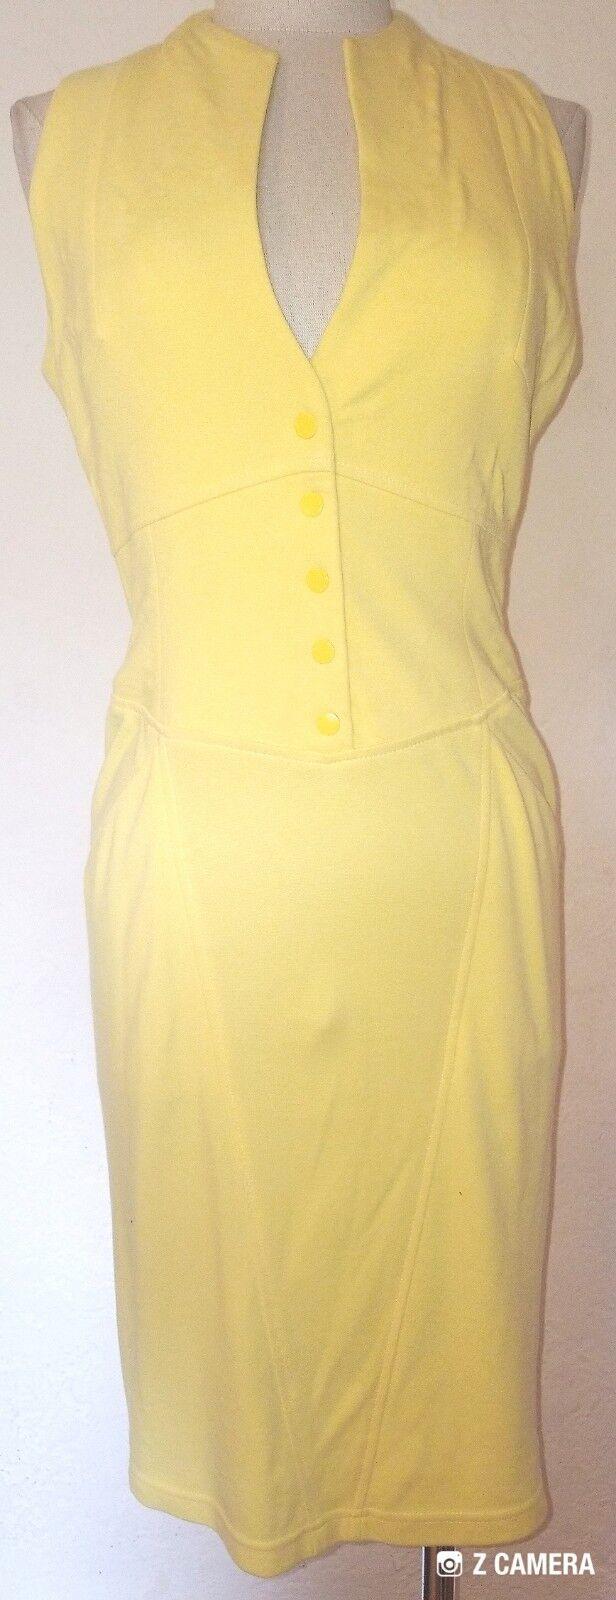 Catherine Malandrino Bright Yellow Dress Size S  - image 1